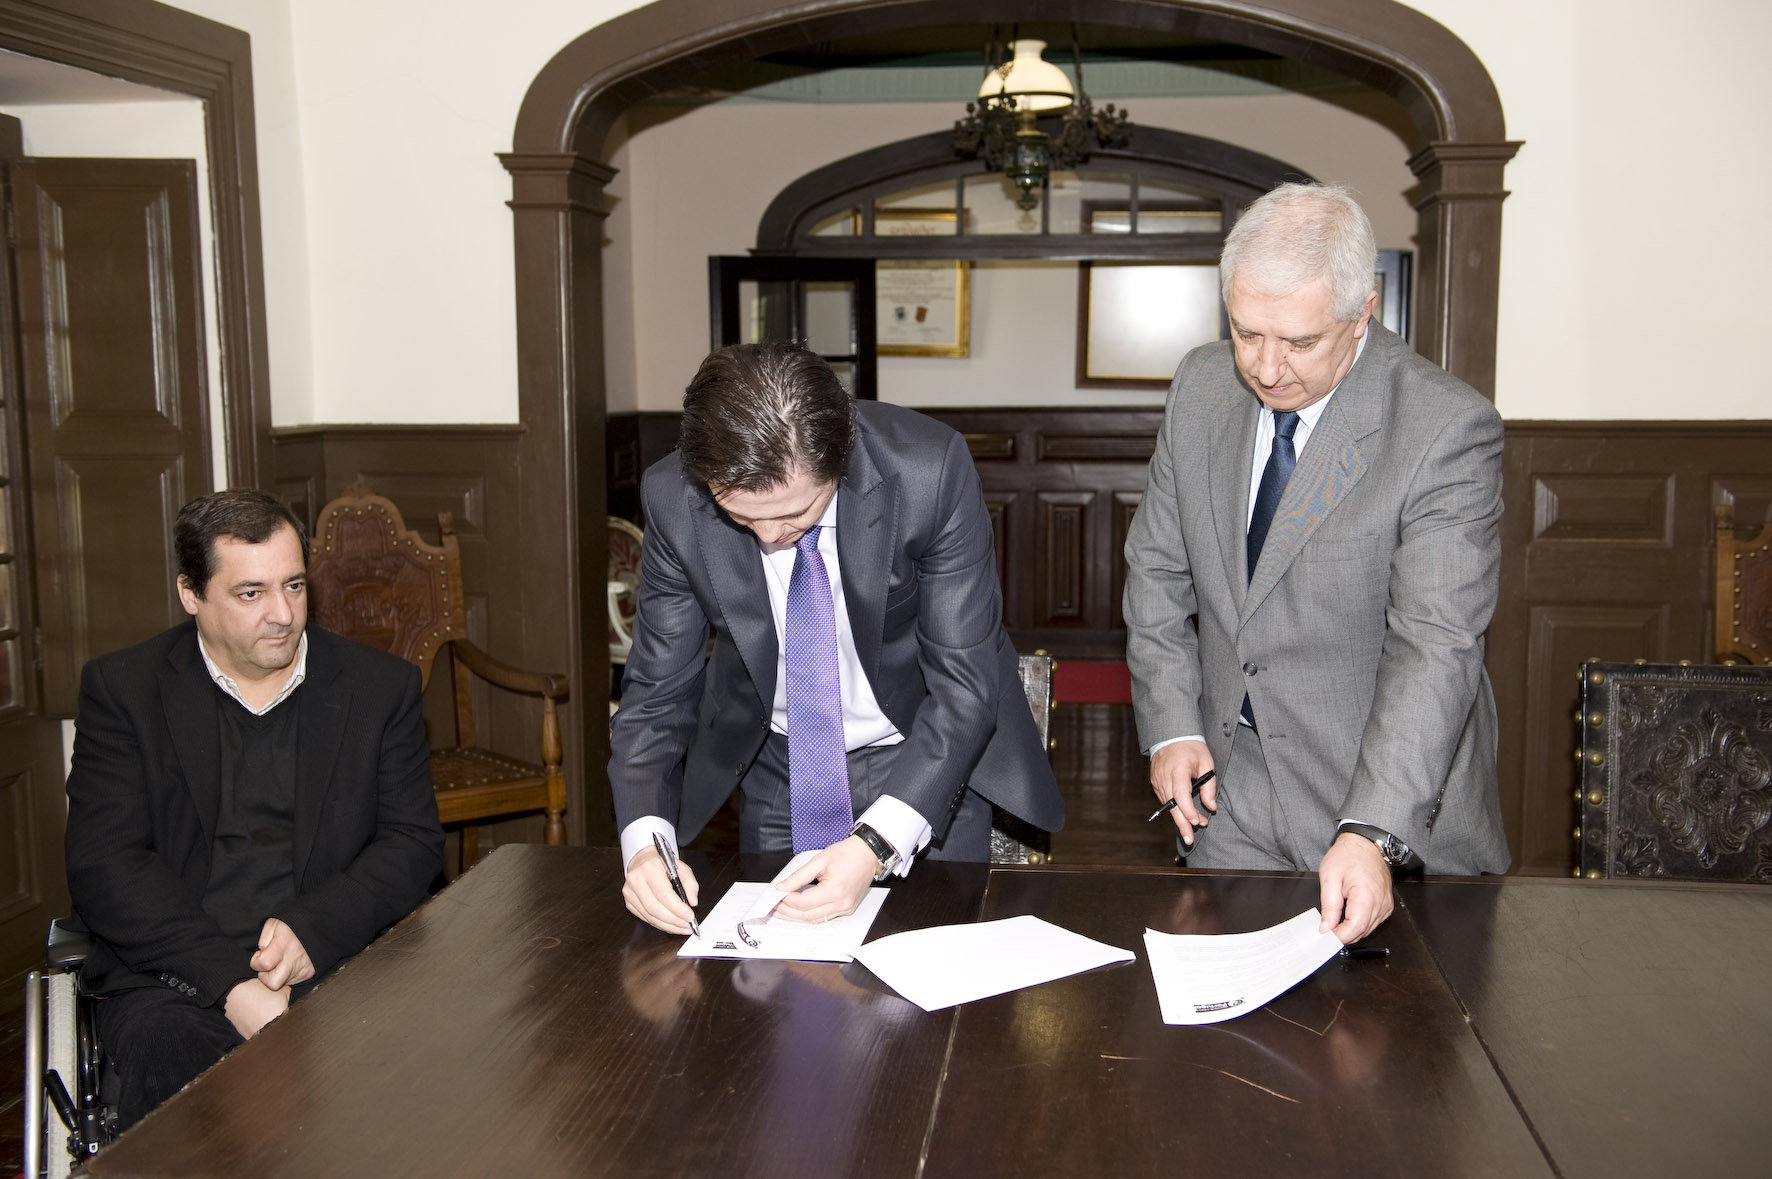 Assinatura do Protocolo FAP - CM Celorico de Basto